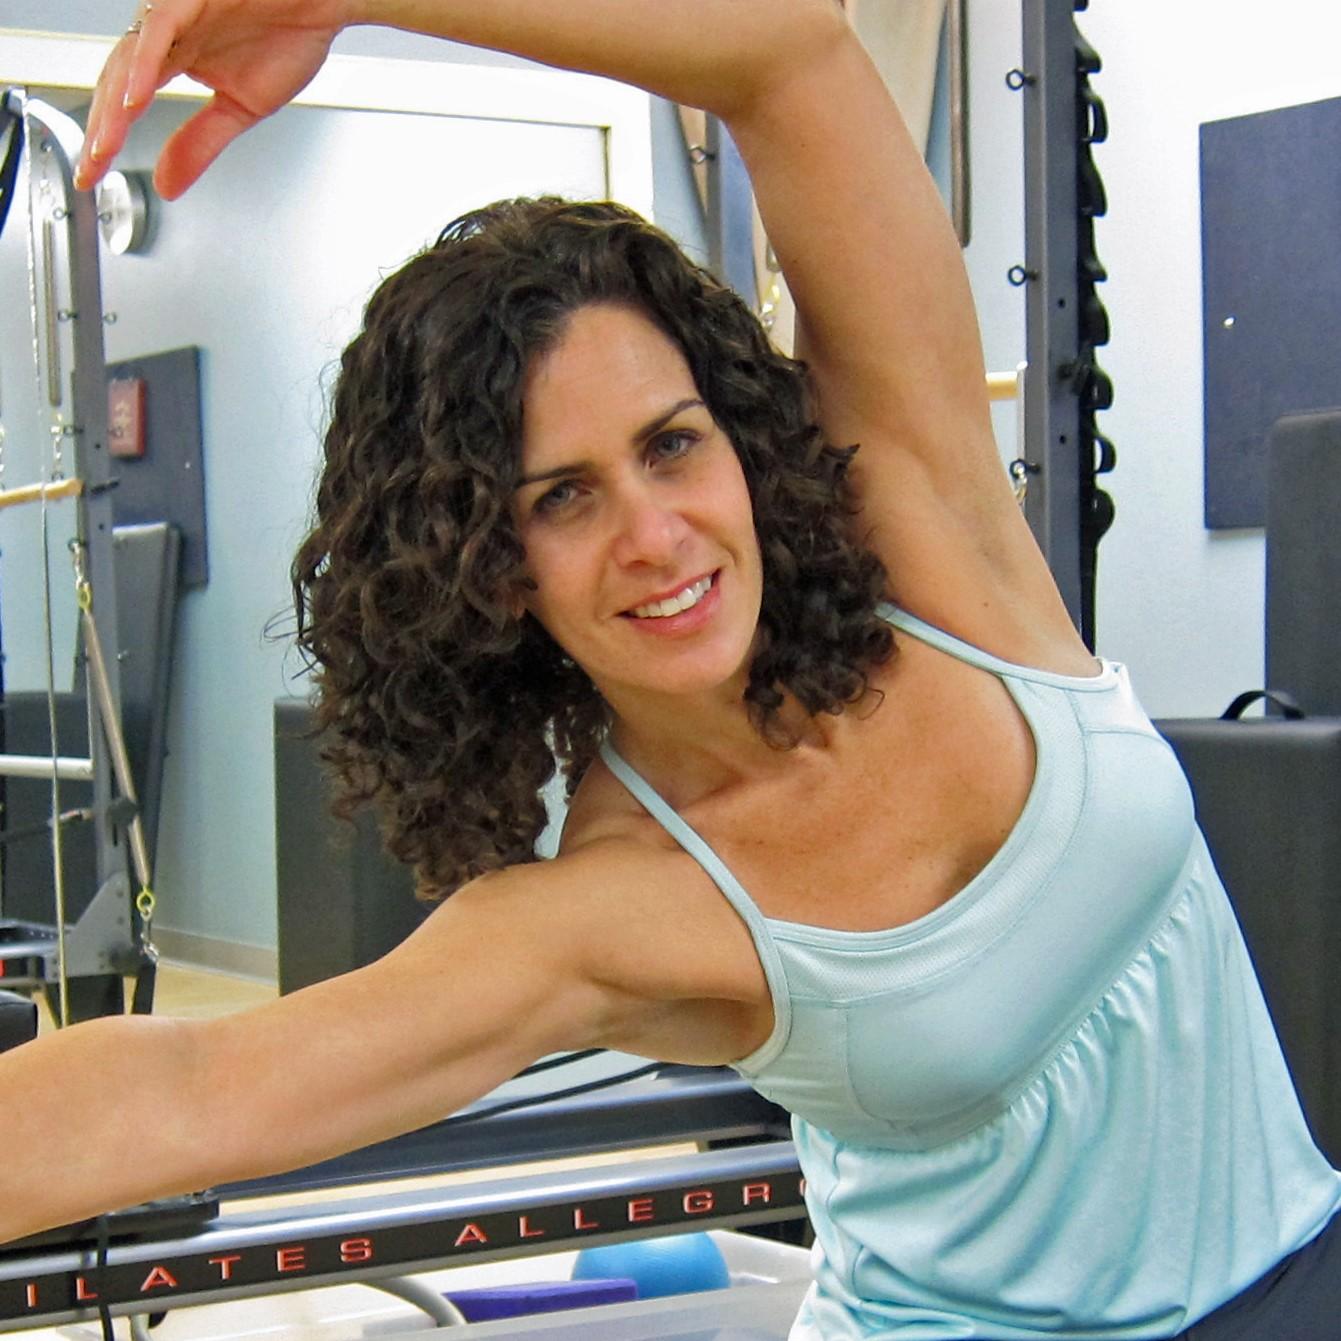 Managed Fitness Team | Managed Fitness | Summit NJ Bar & Pilates Studio